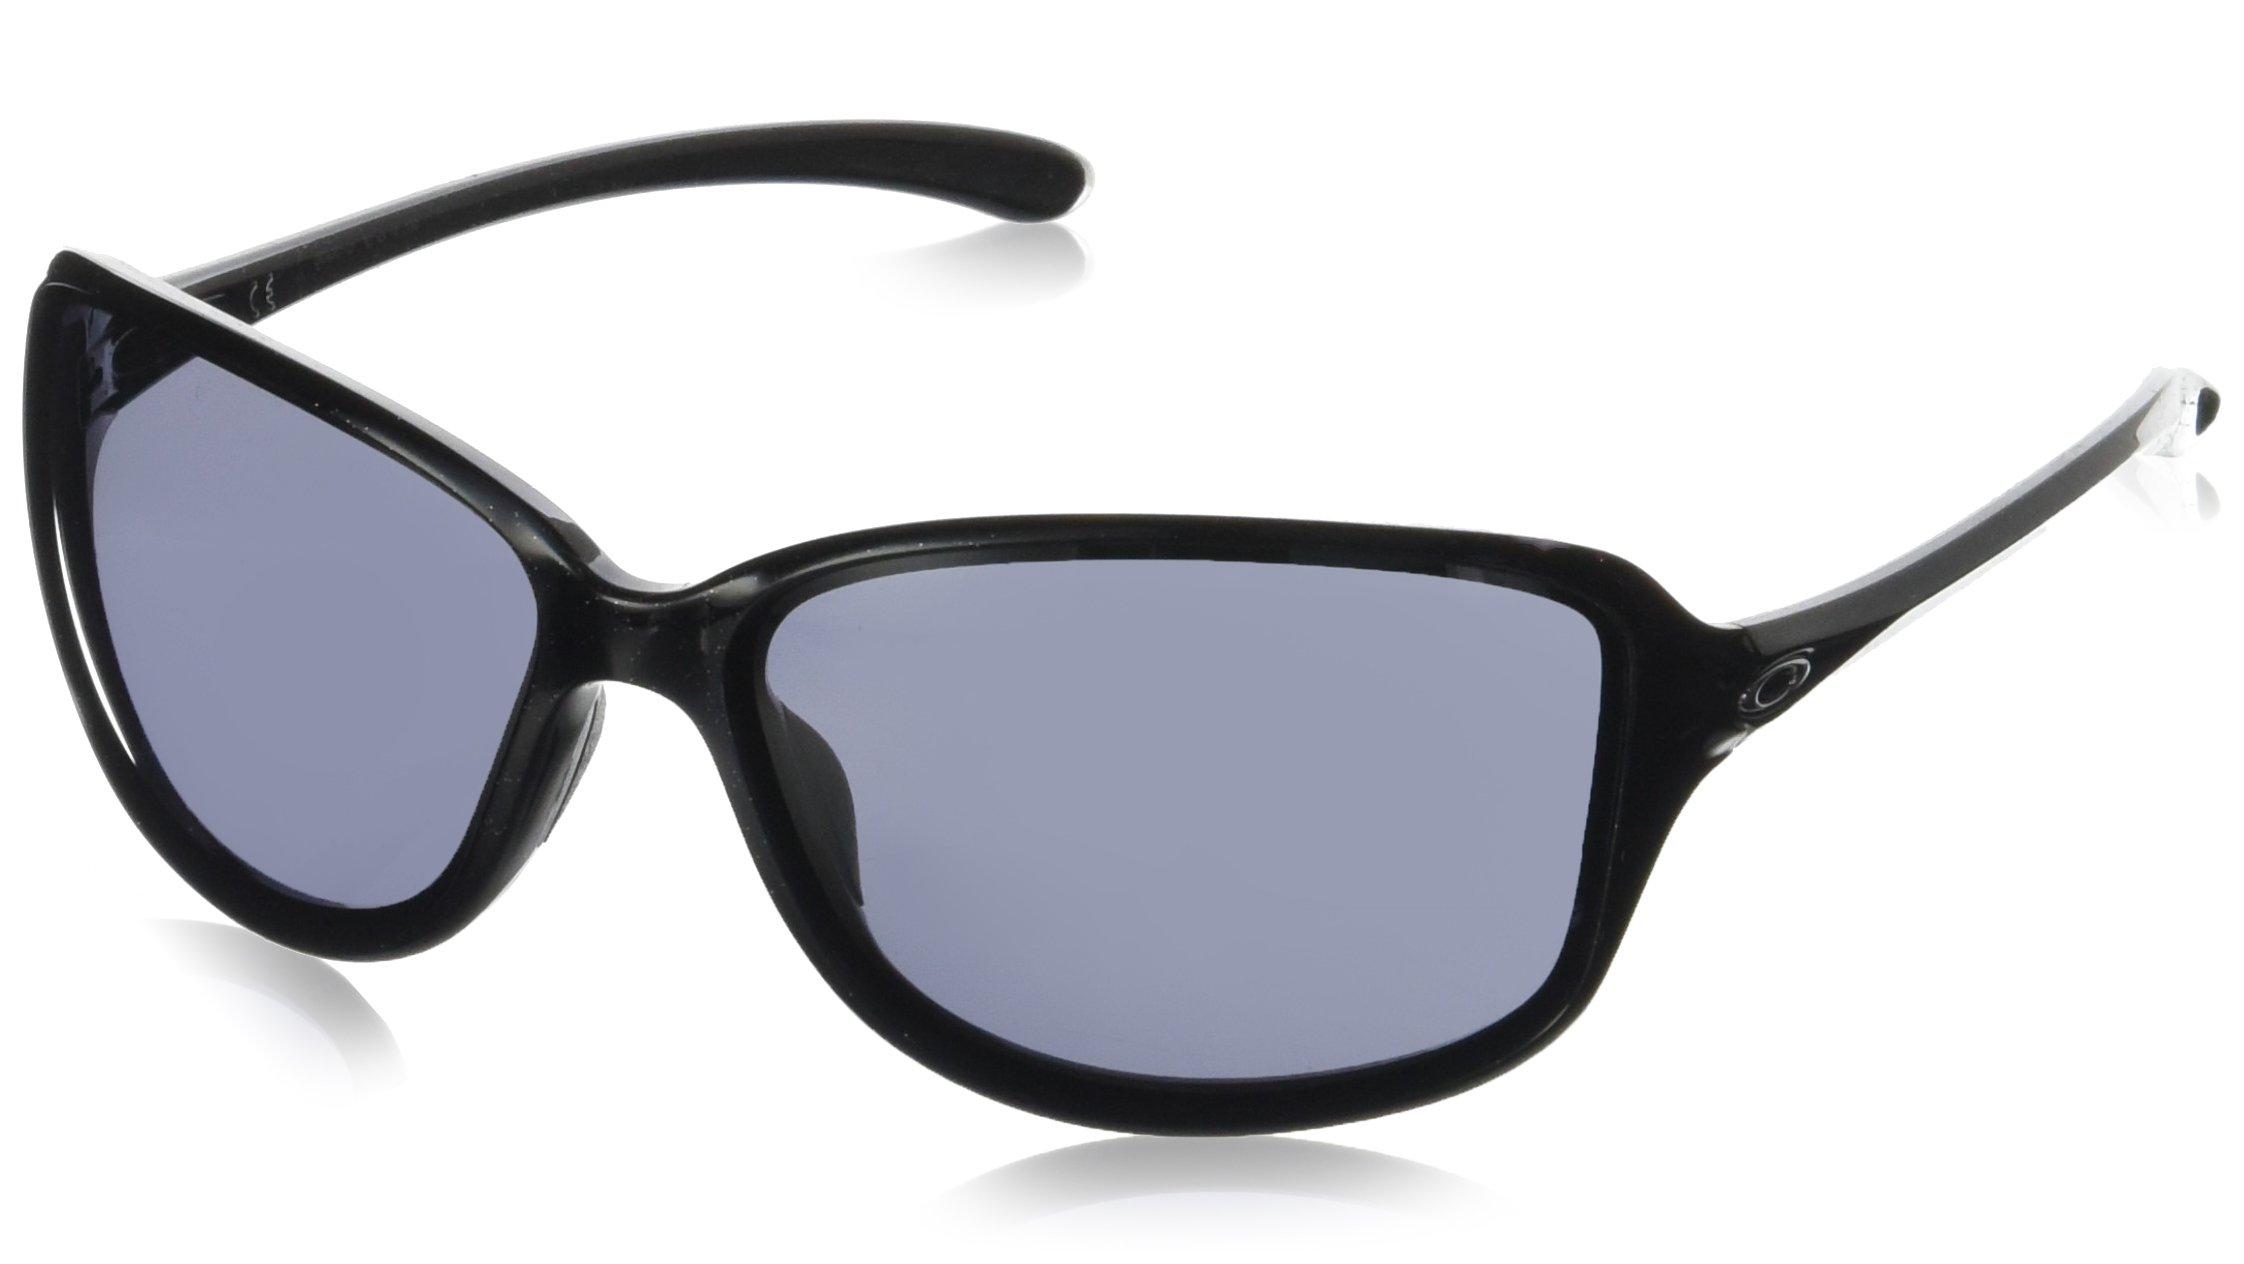 Oakley Women's Cohort Rectangular Sunglasses METALLIC BLACK 61 mm